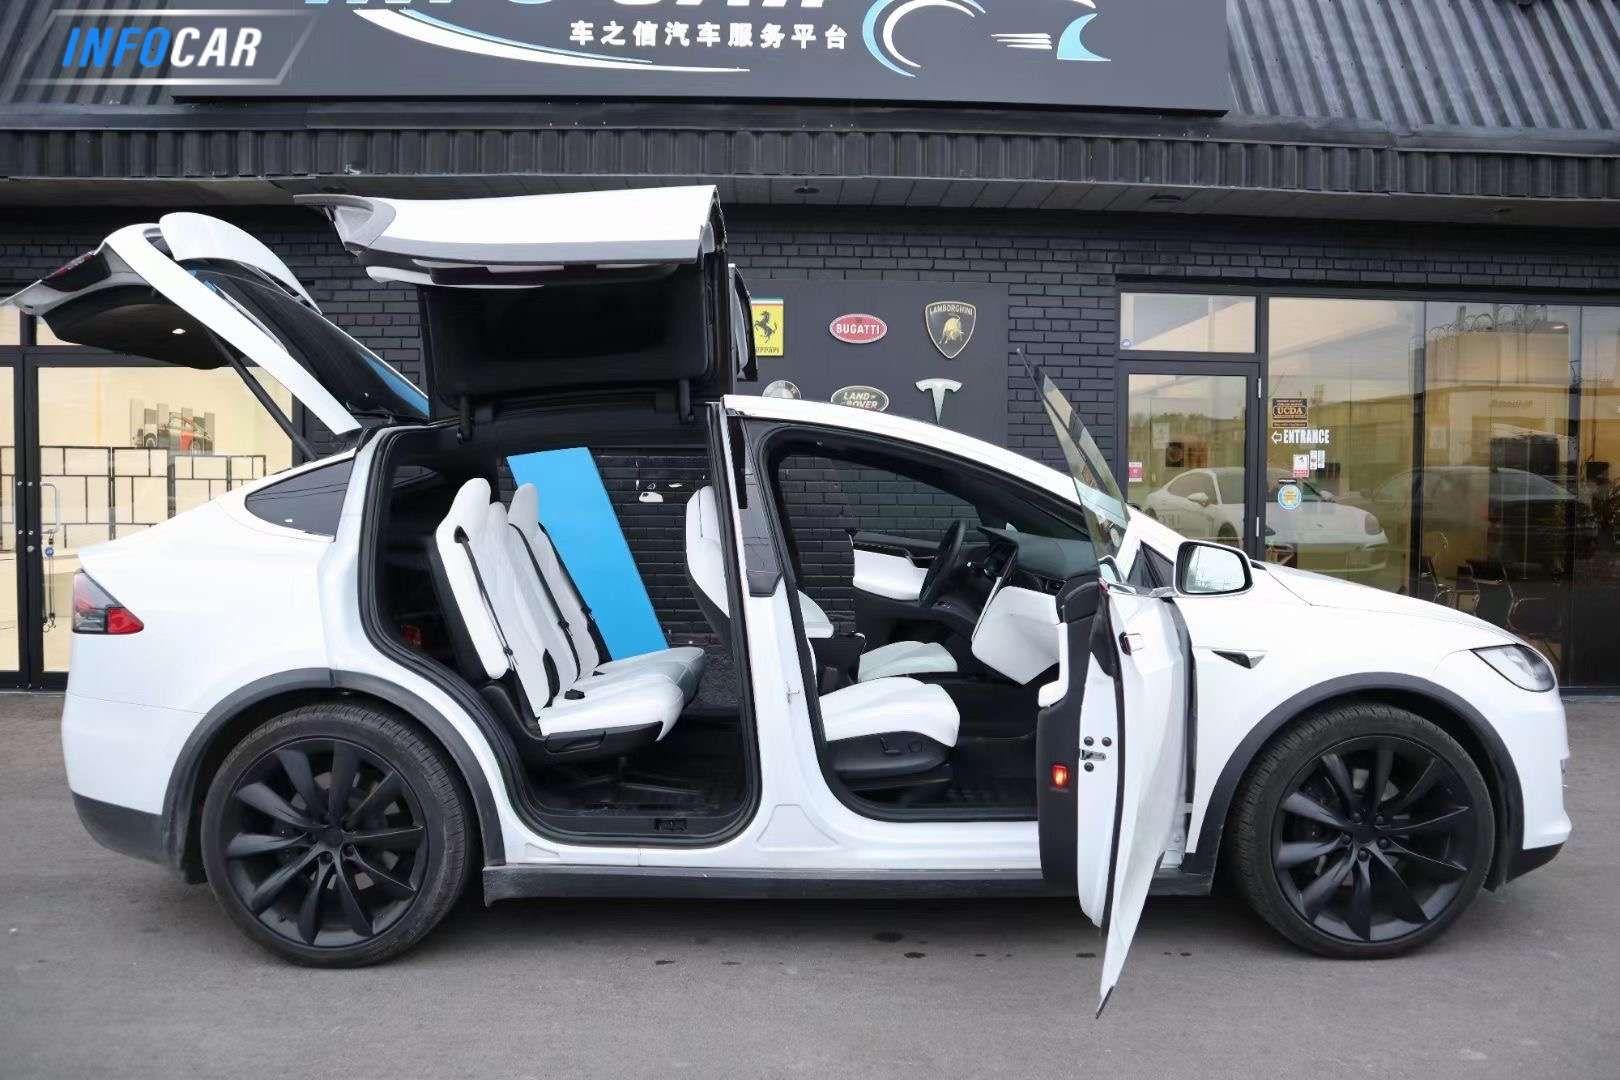 2019 Tesla Model X MODEL X LONG RANGE - INFOCAR - Toronto's Most Comprehensive New and Used Auto Trading Platform